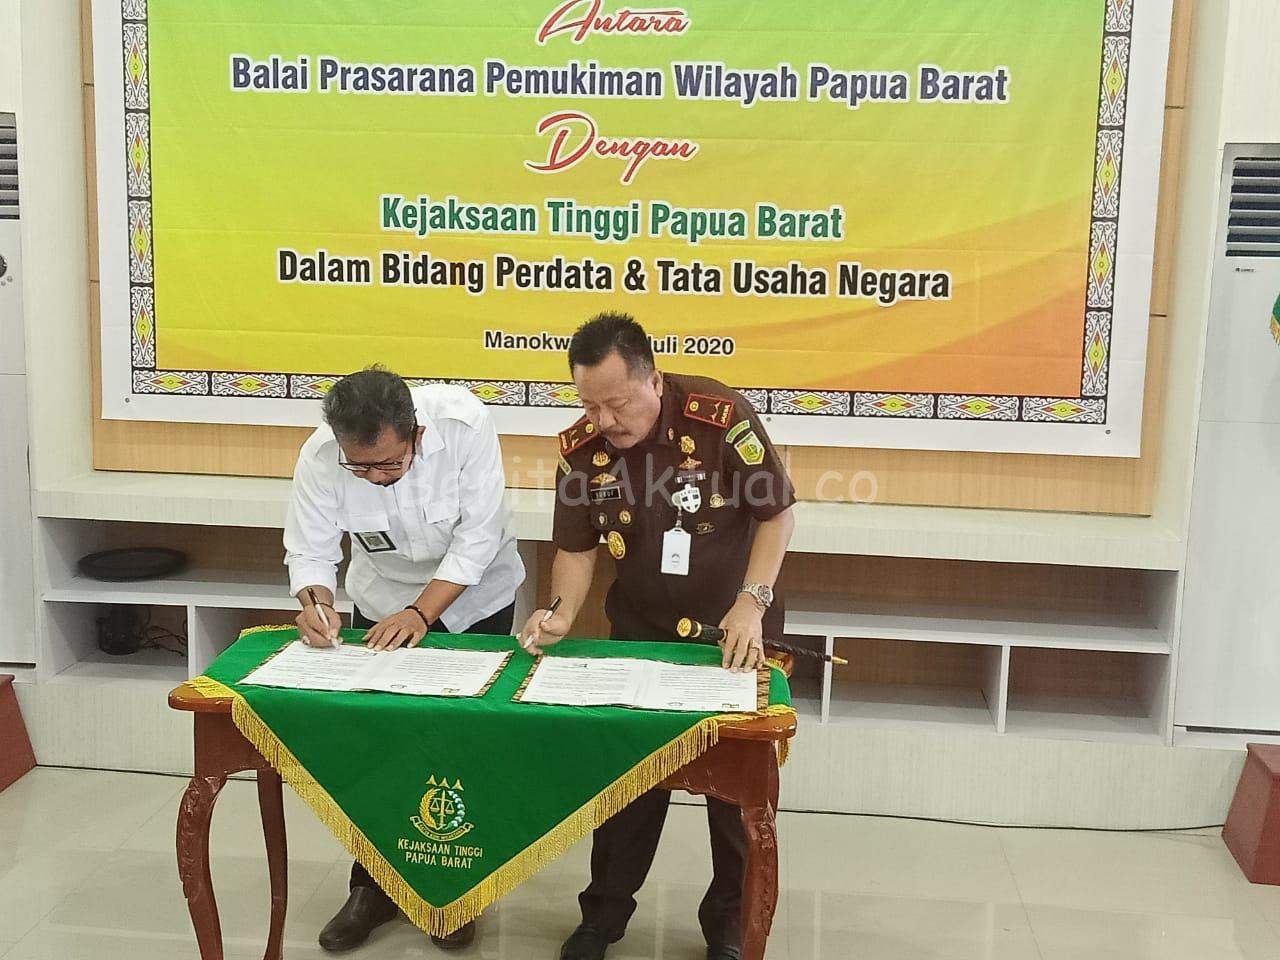 Kawal Proyek Strategis, BPPW PB Dan Kejati Papua Barat Teken MoU 11 IMG 20200715 WA0026